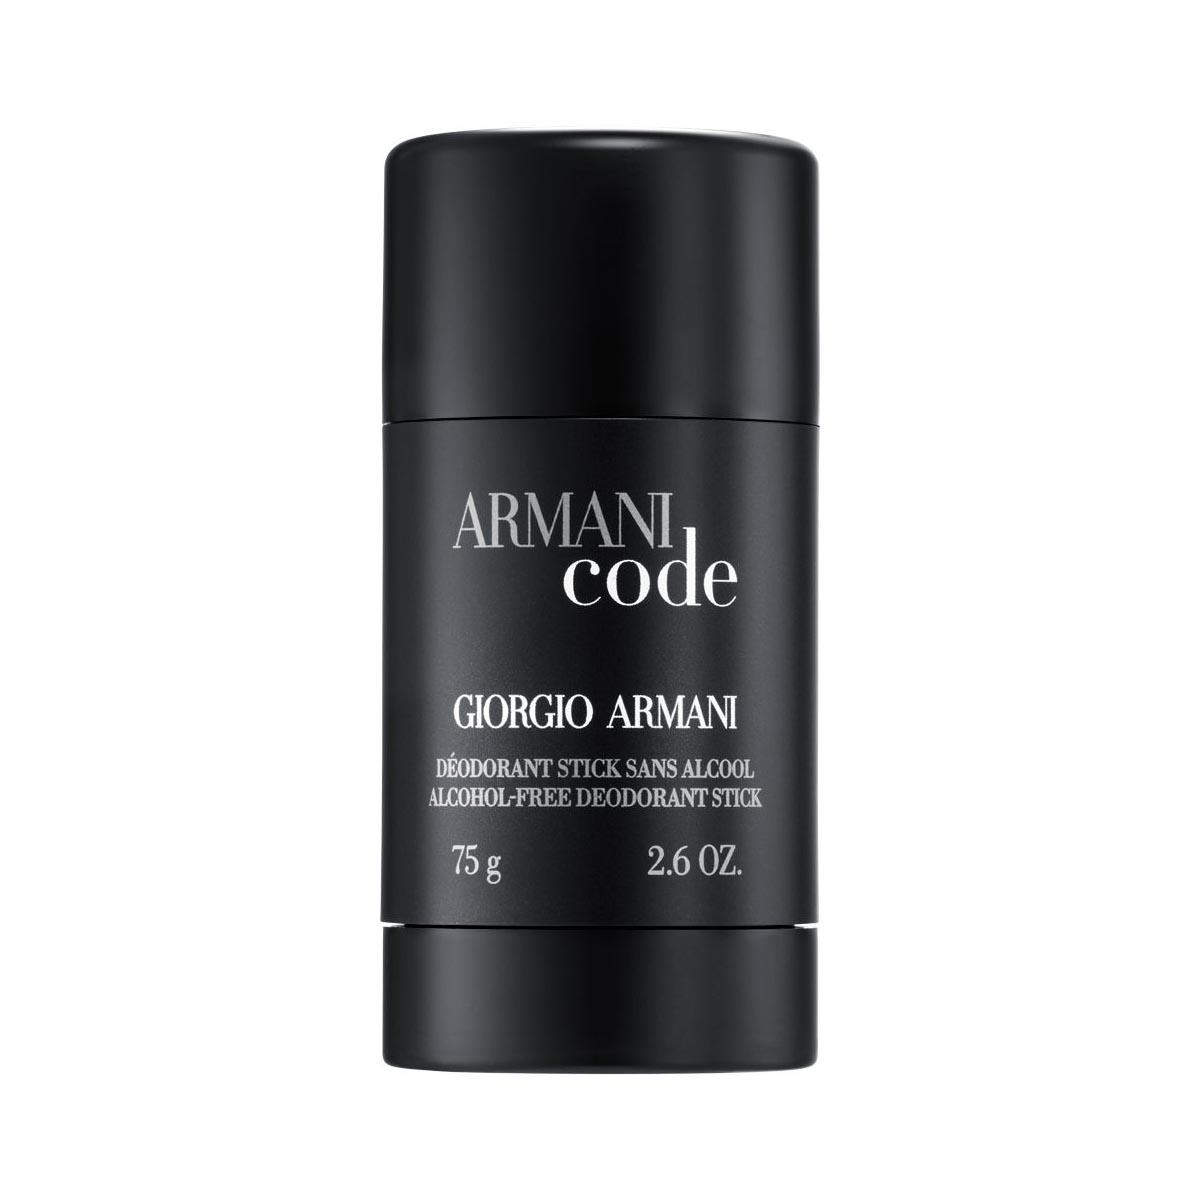 Giorgio armani black code deodorant stick 75gr